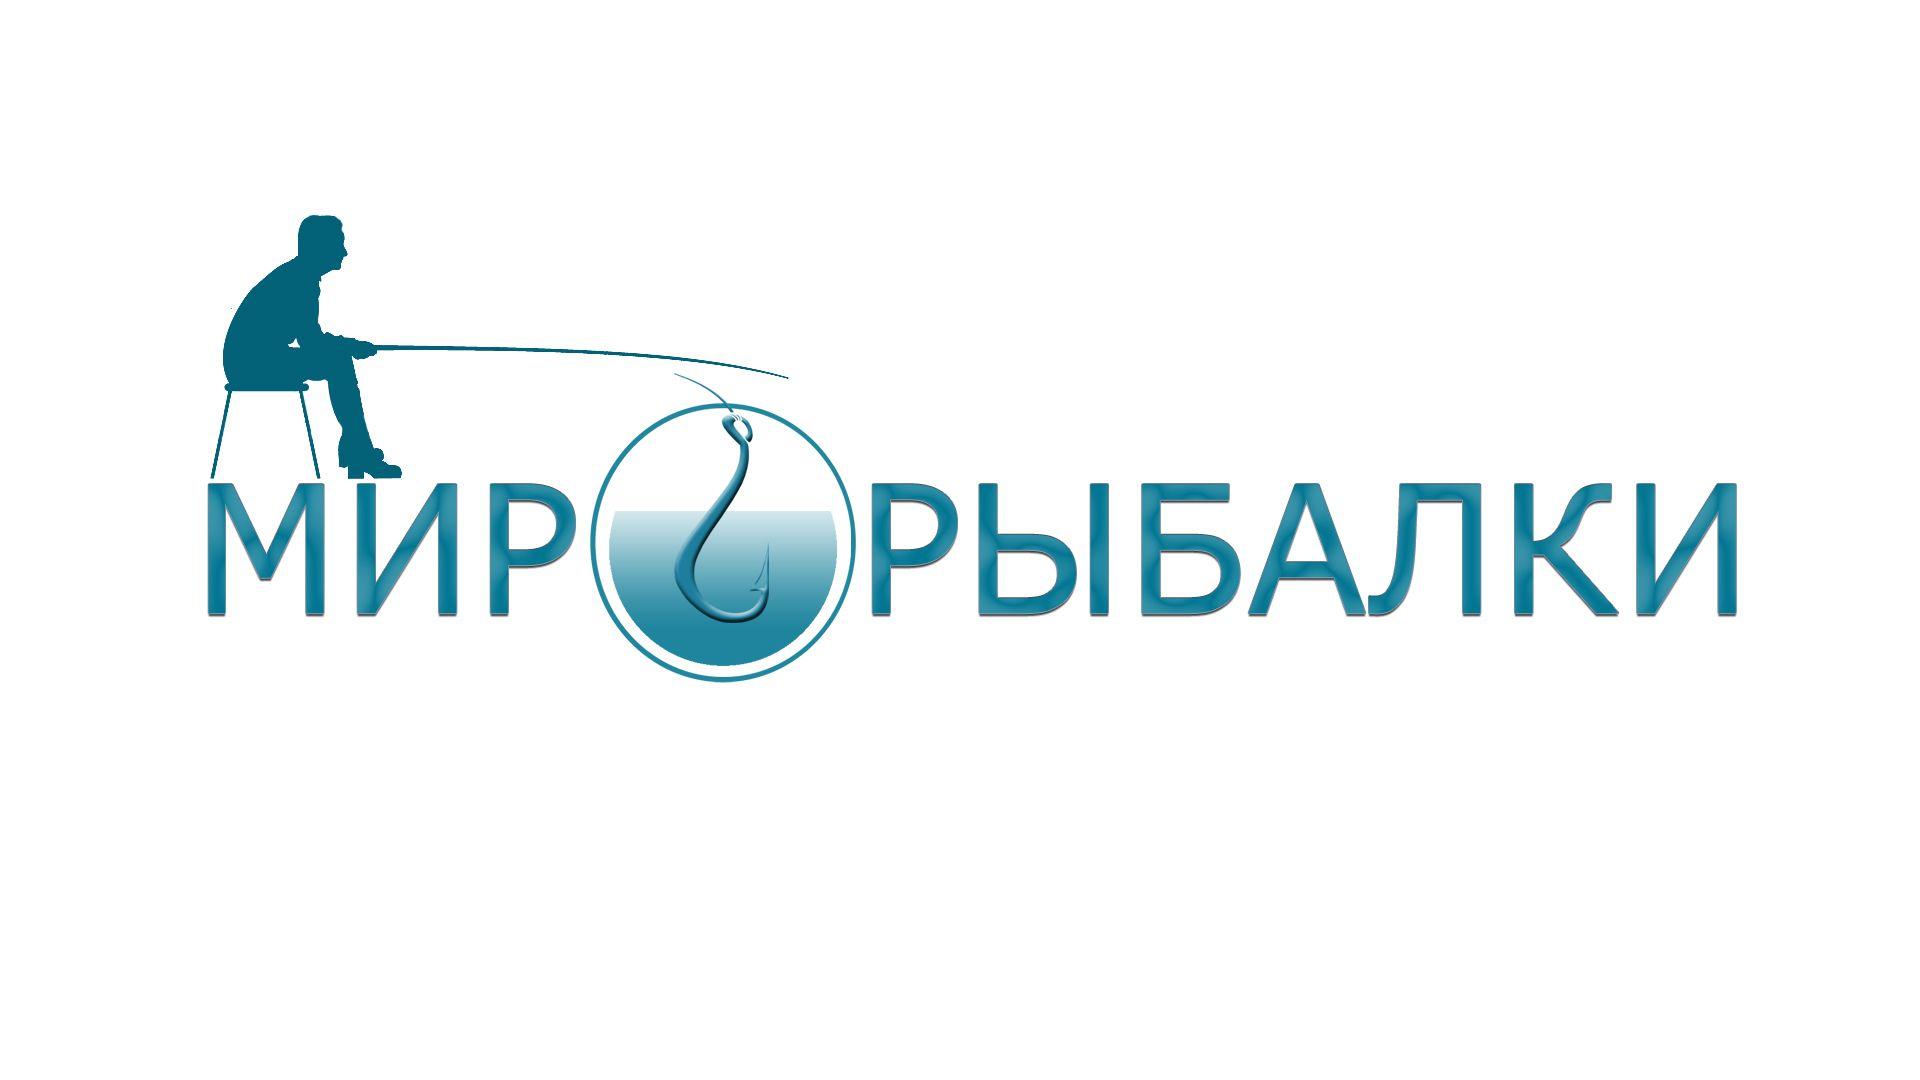 Логотип рыболовного магазина - дизайнер JusticeMusic